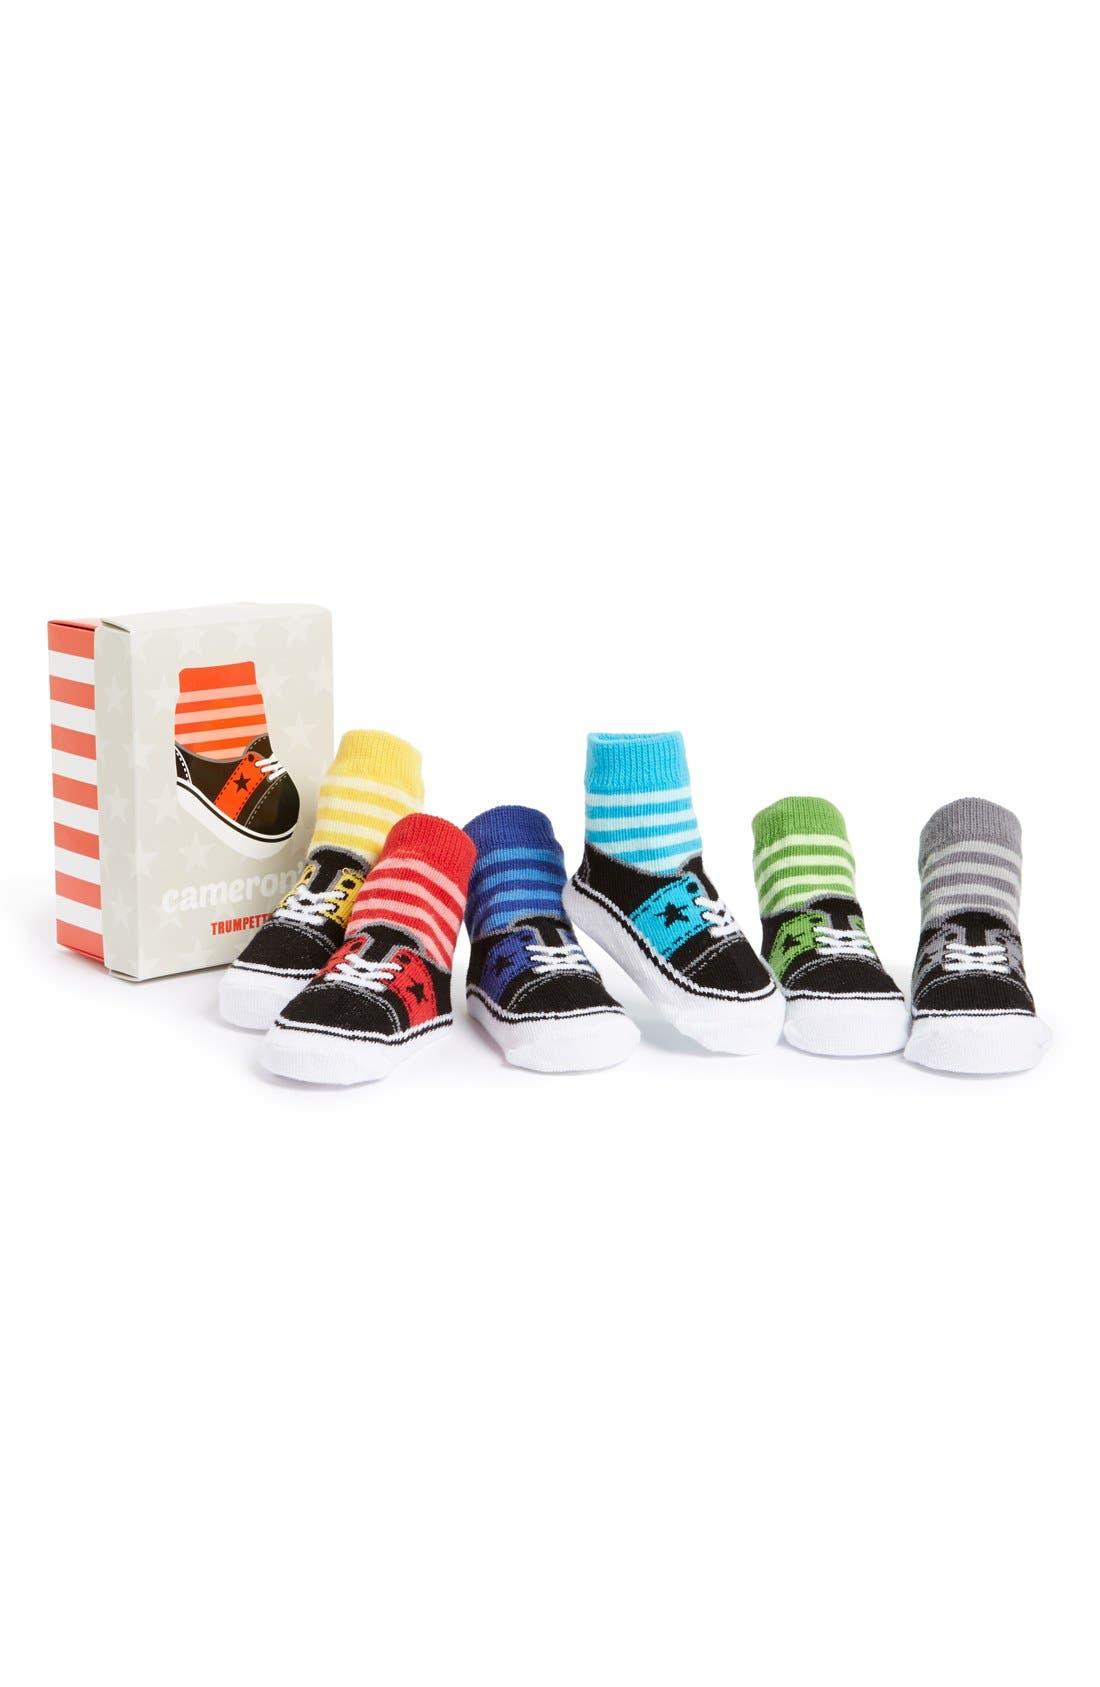 Alternate Image 1 Selected - Trumpette Cameron 6-Pack Socks (Baby Boys)